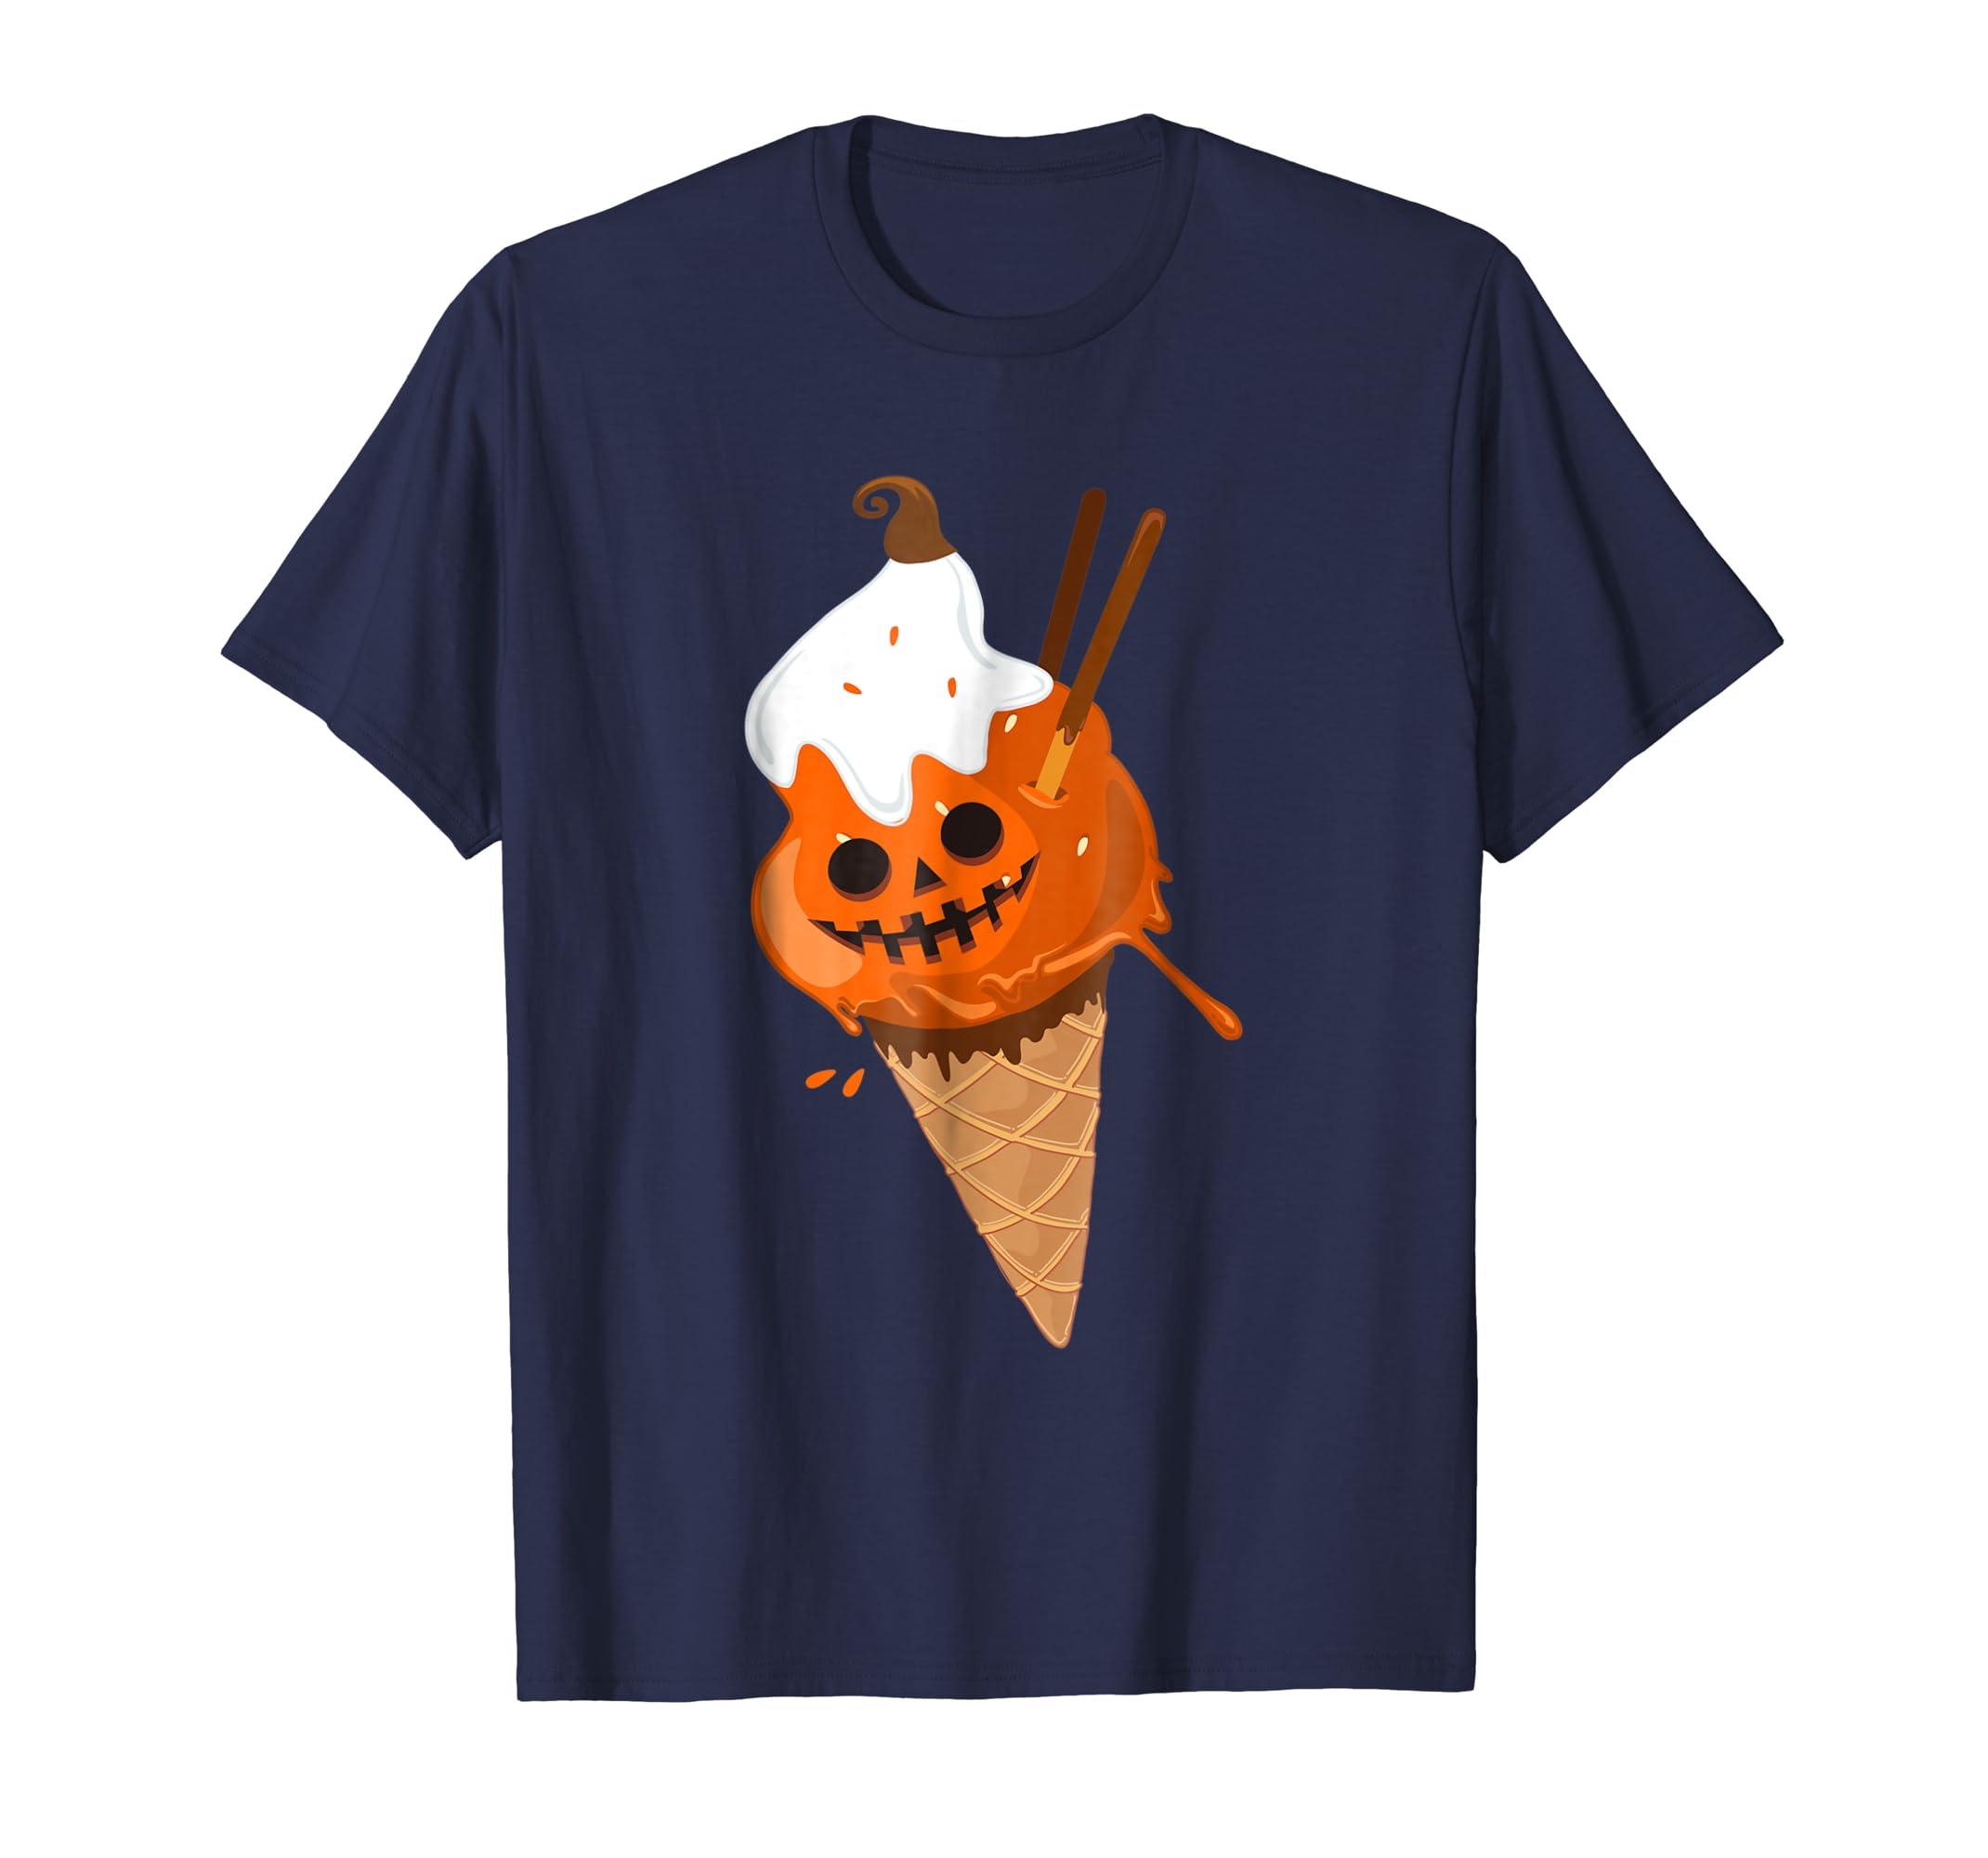 Pumpkin Ice Cream T-Shirt Jack O Lantern Smile-mt